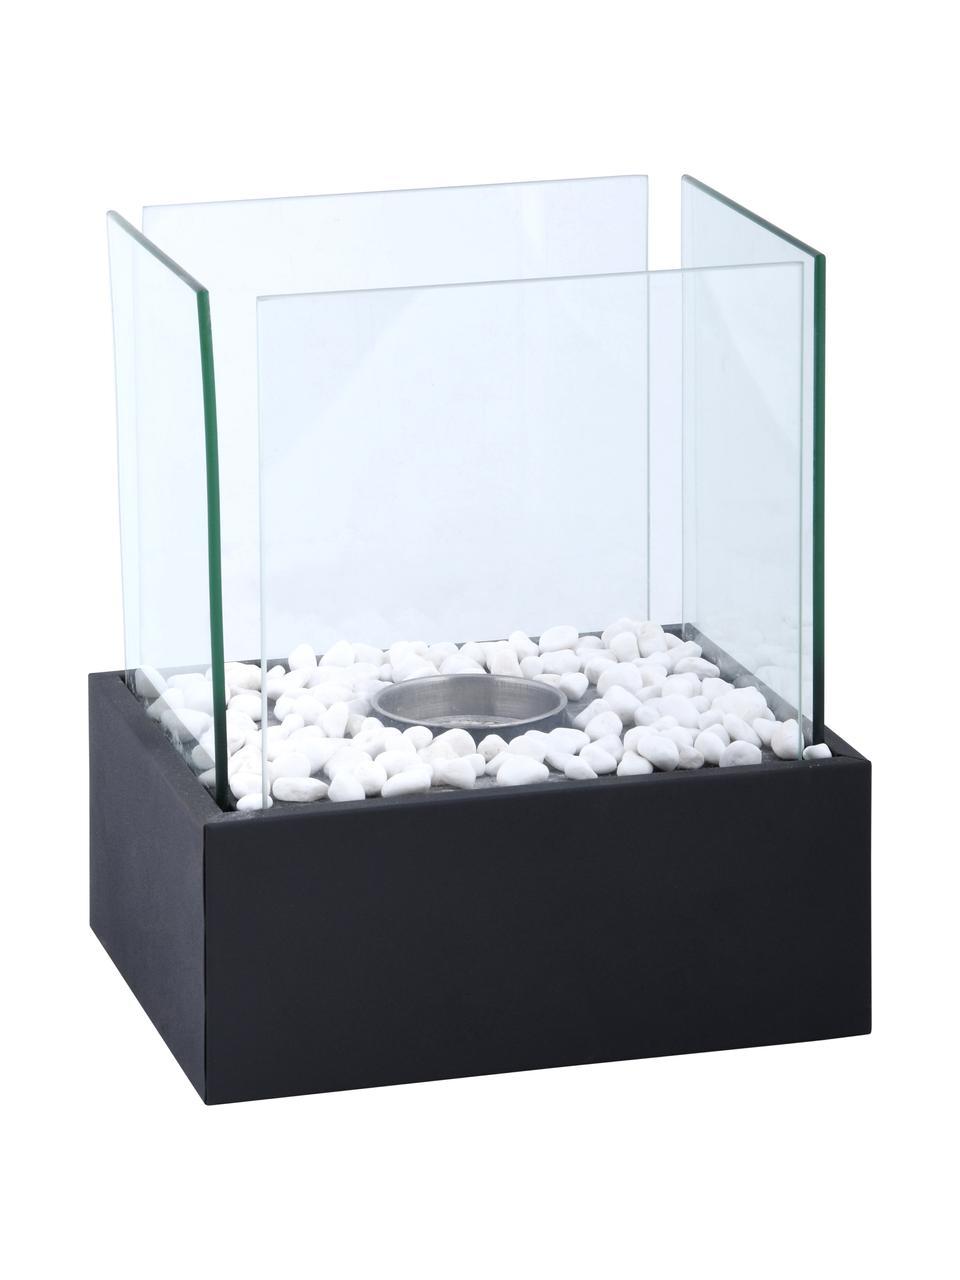 Bioethanol-Tischkamin Damin, Sockel: Metall, beschichtet, Schwarz, Transparent, 25 x 28 cm